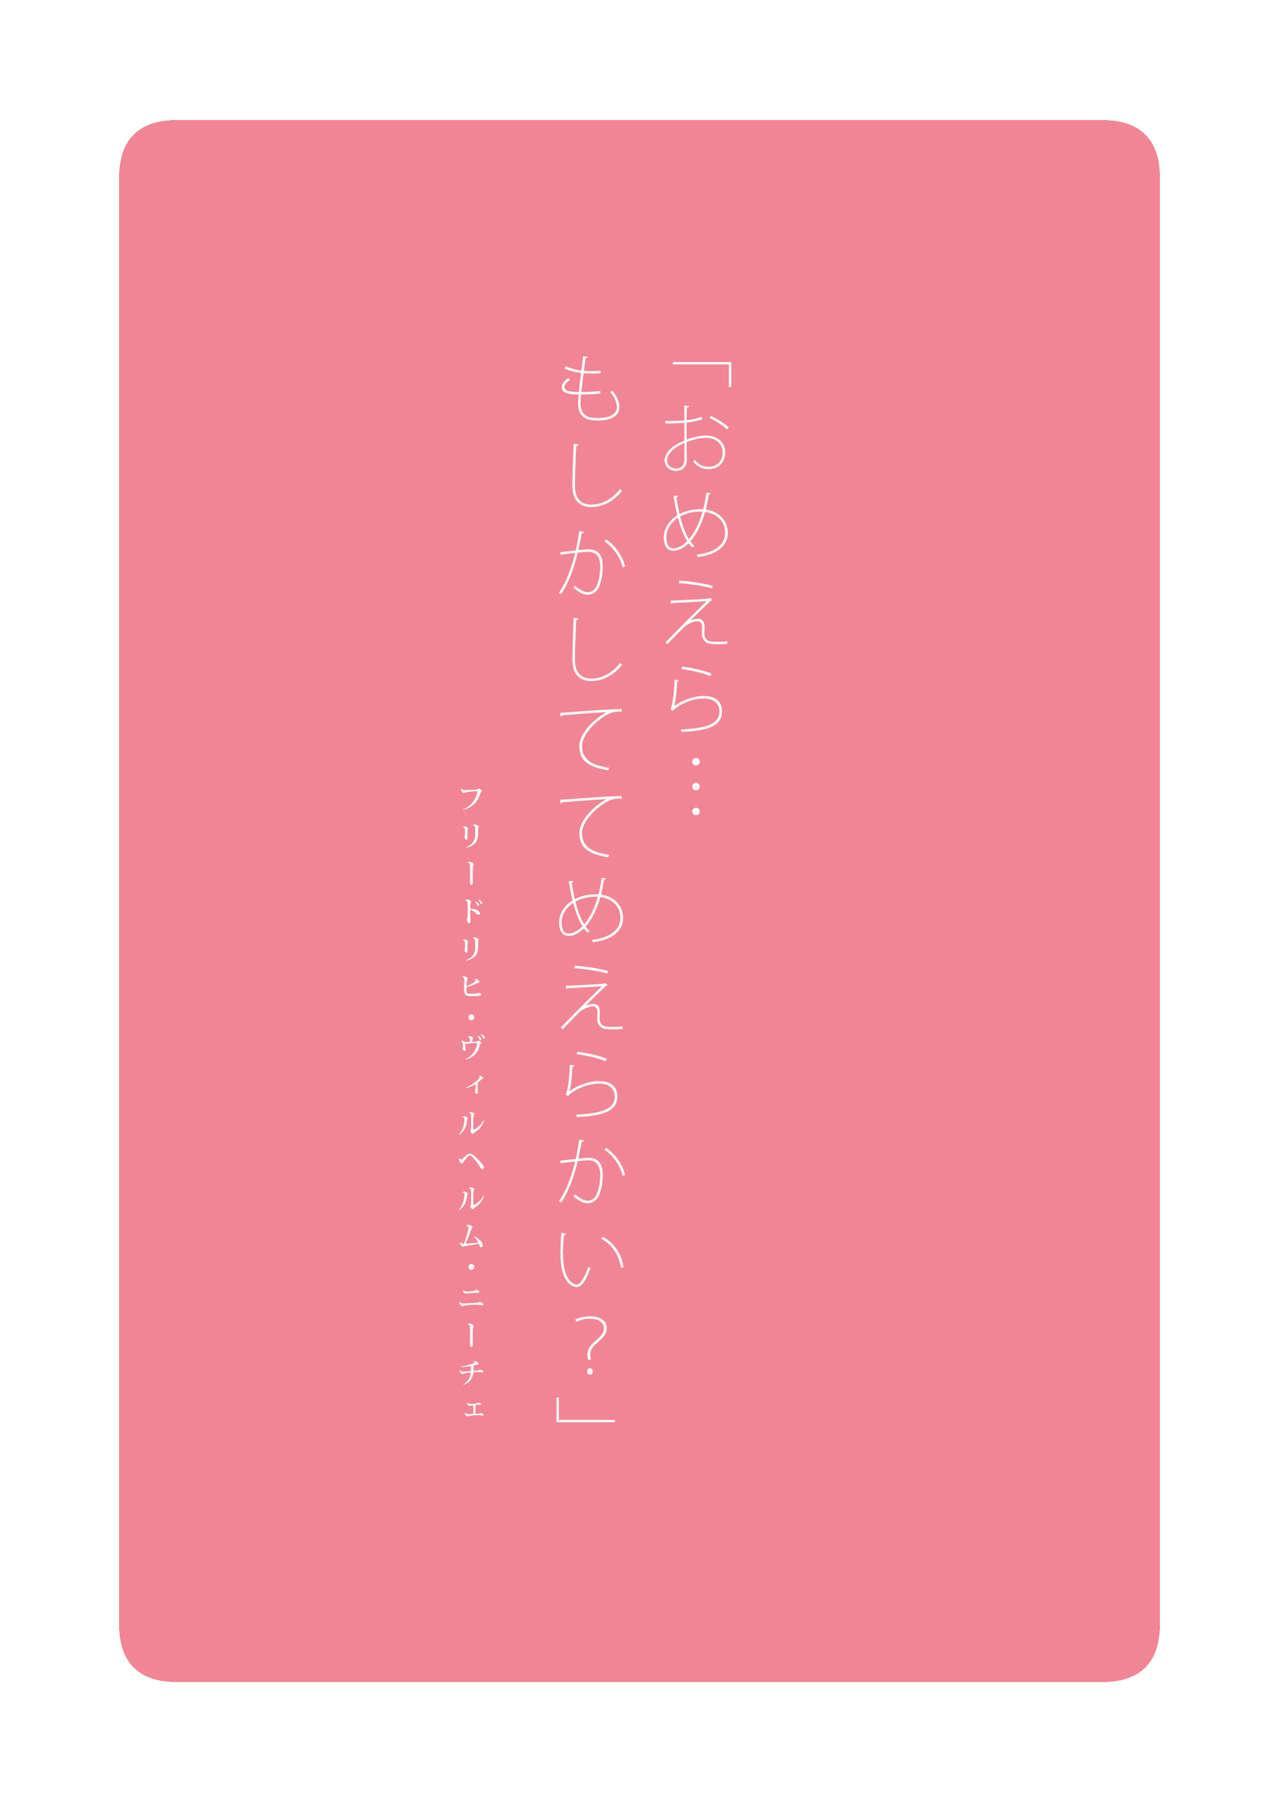 Isogasii Okaasan No Tamuno Sasa Rouzin Seikaigo | Guide for Elderly Sex Health Care to Busy Mom 31